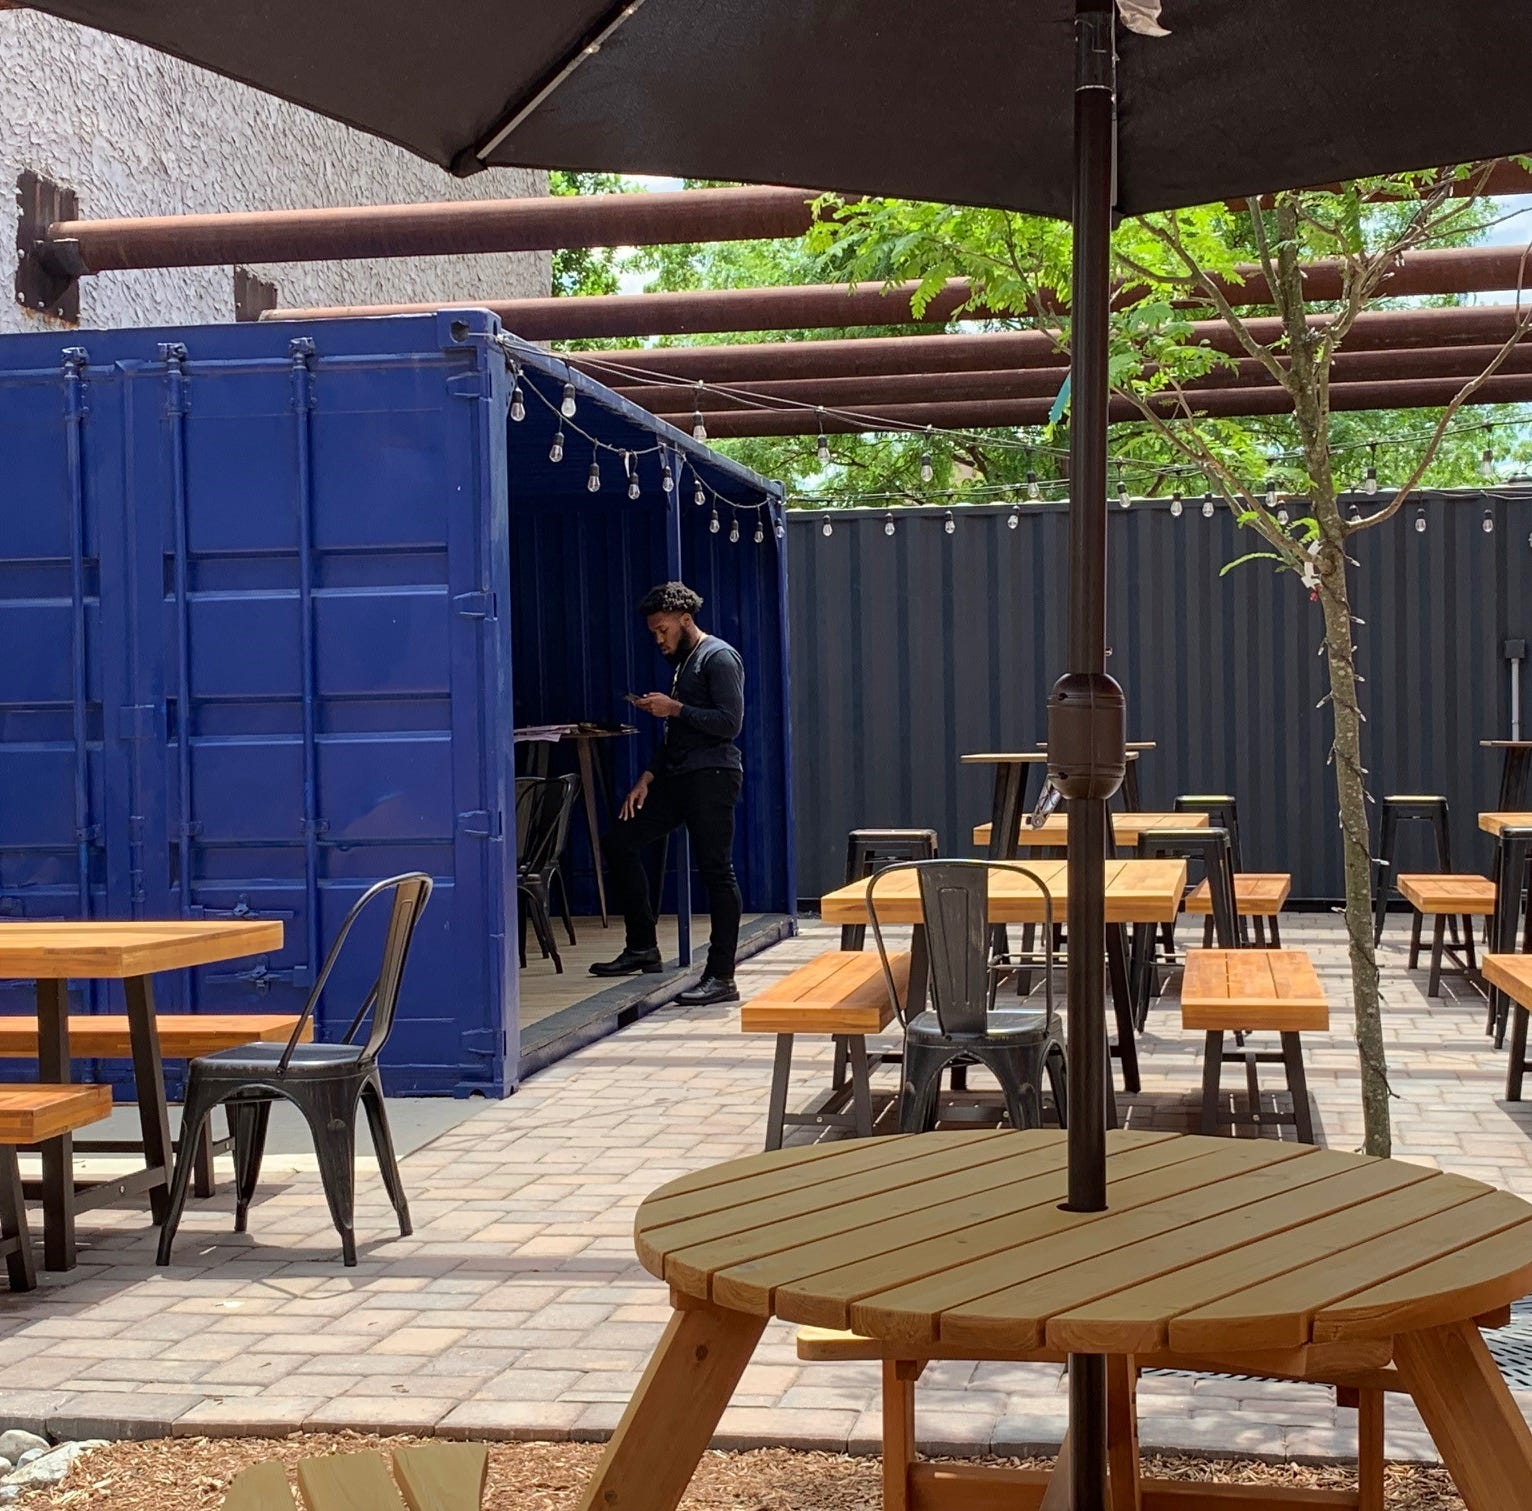 A beer garden grows in Camden: Arts Yard is open for business on Market Street